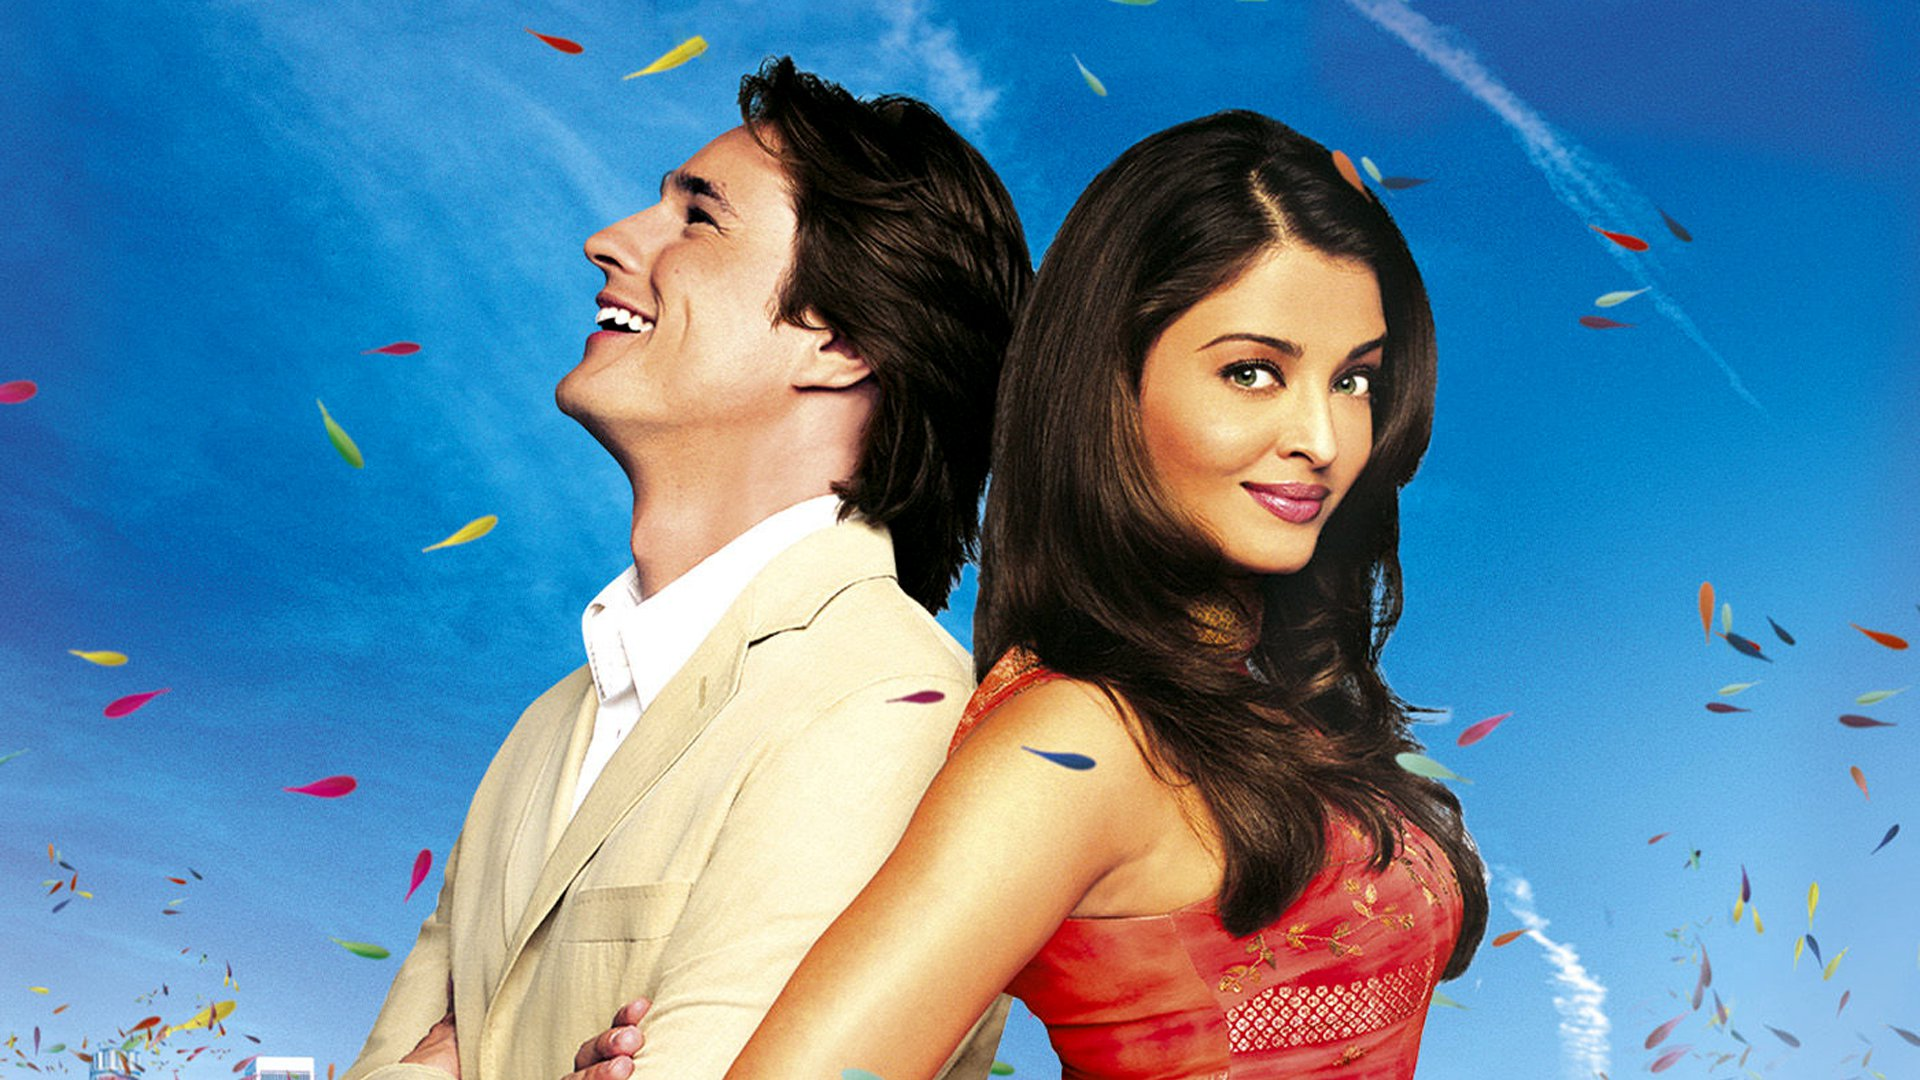 Coup de foudre bollywood 2004 film cin s ries - Le film coup de foudre a bollywood ...